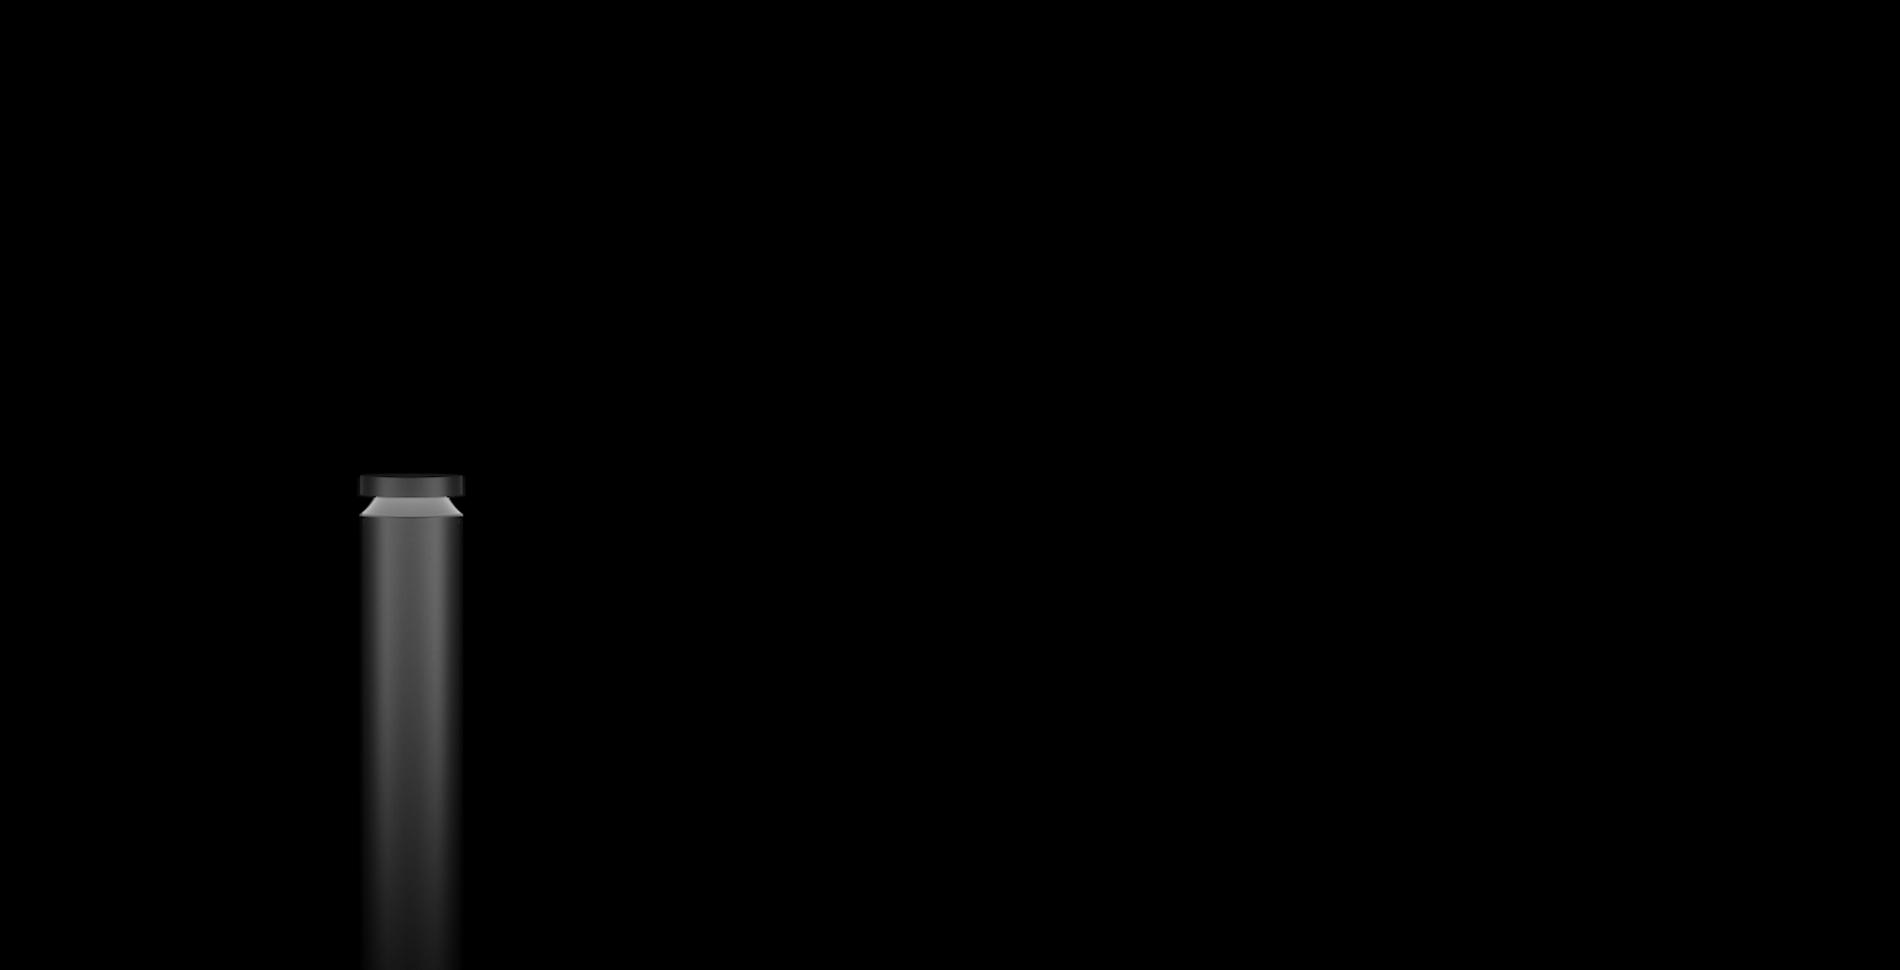 Sequenza-0221